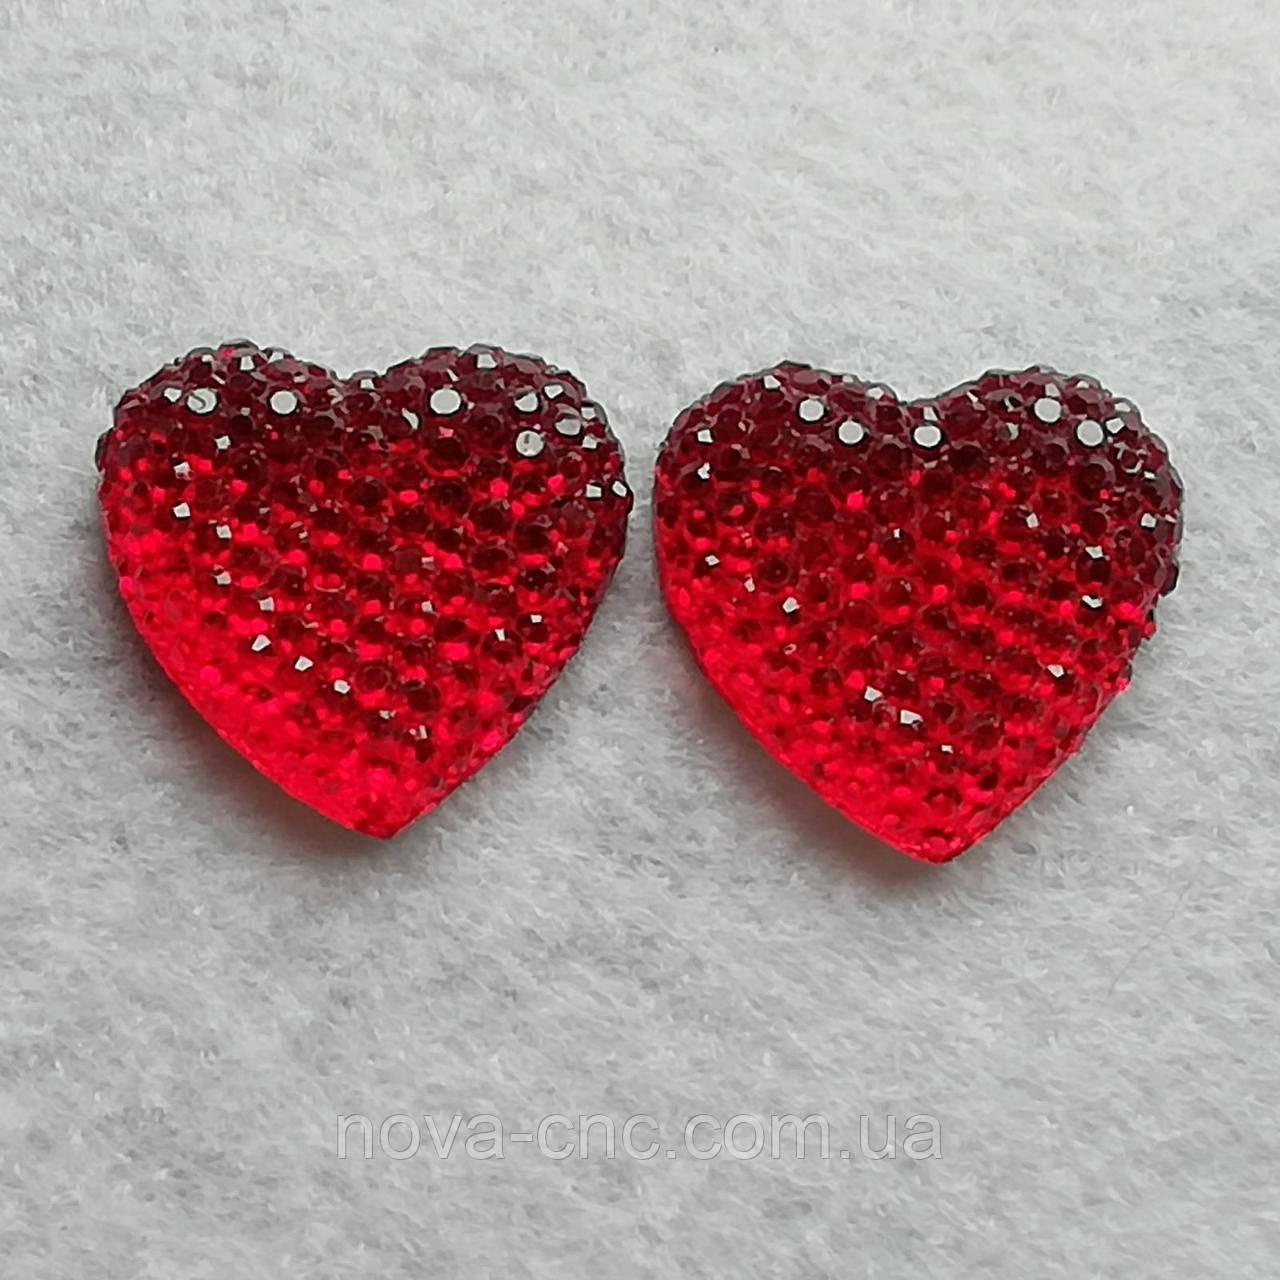 "Клеевые кабошоны ""Сердце""  Цвет красный 20 мм 10 шт уп"